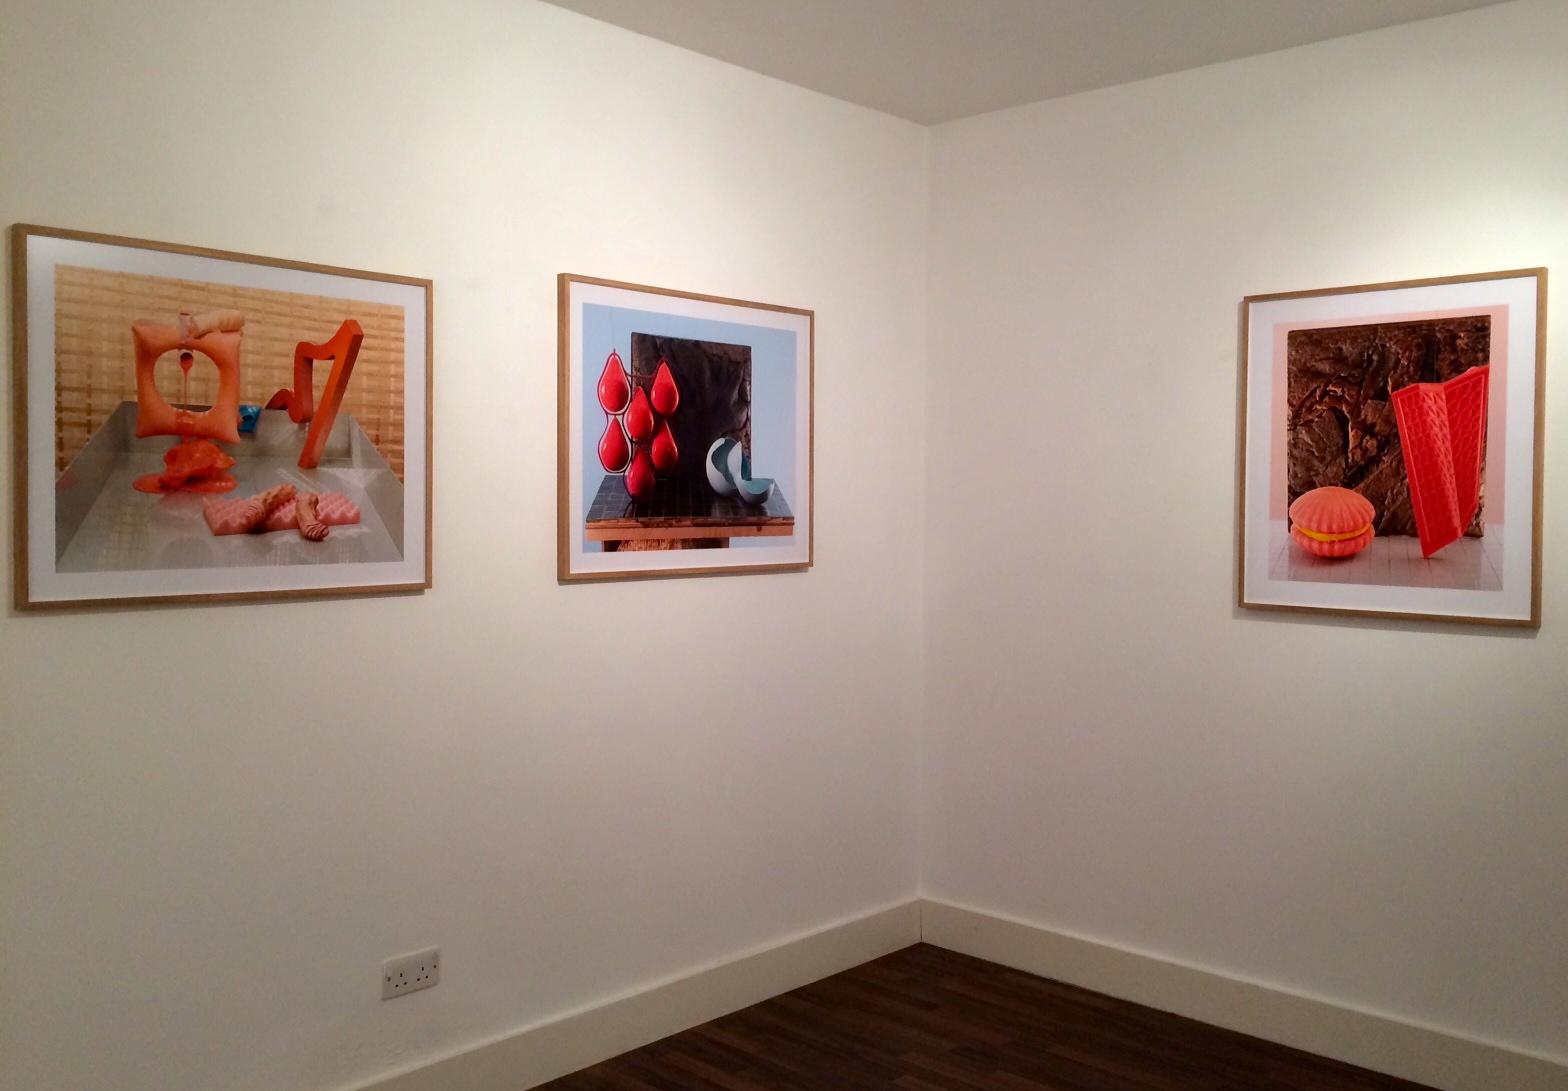 Antonio Marguet High House Gallery